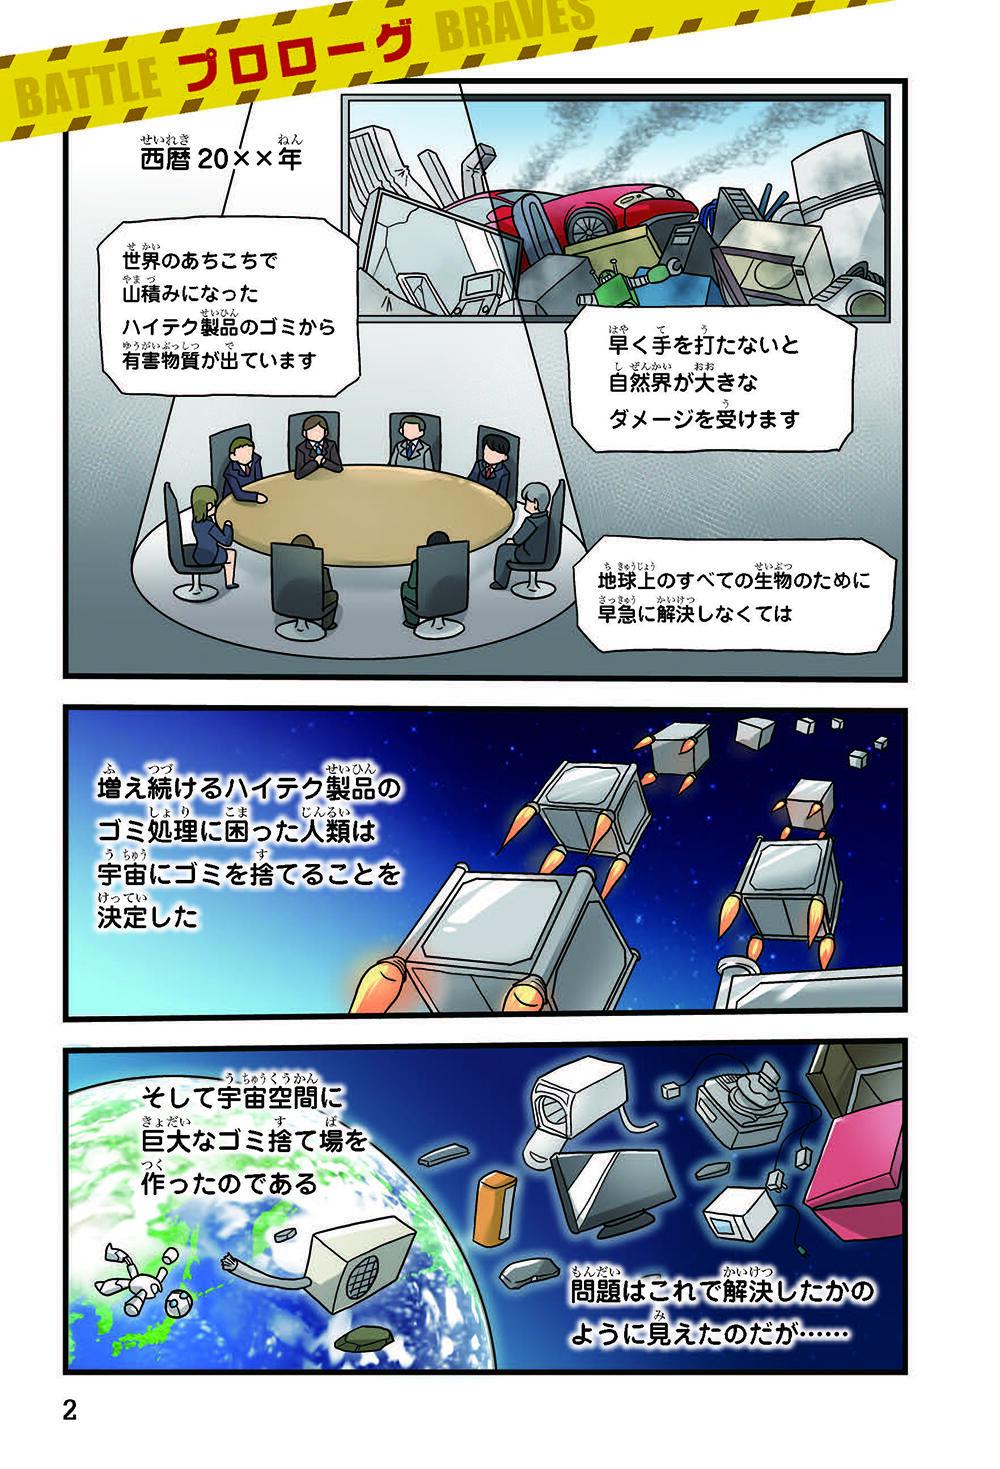 BB_蜊ア髯コ逕溽黄_繝倥z繝シ繧キ繧兩002.jpg